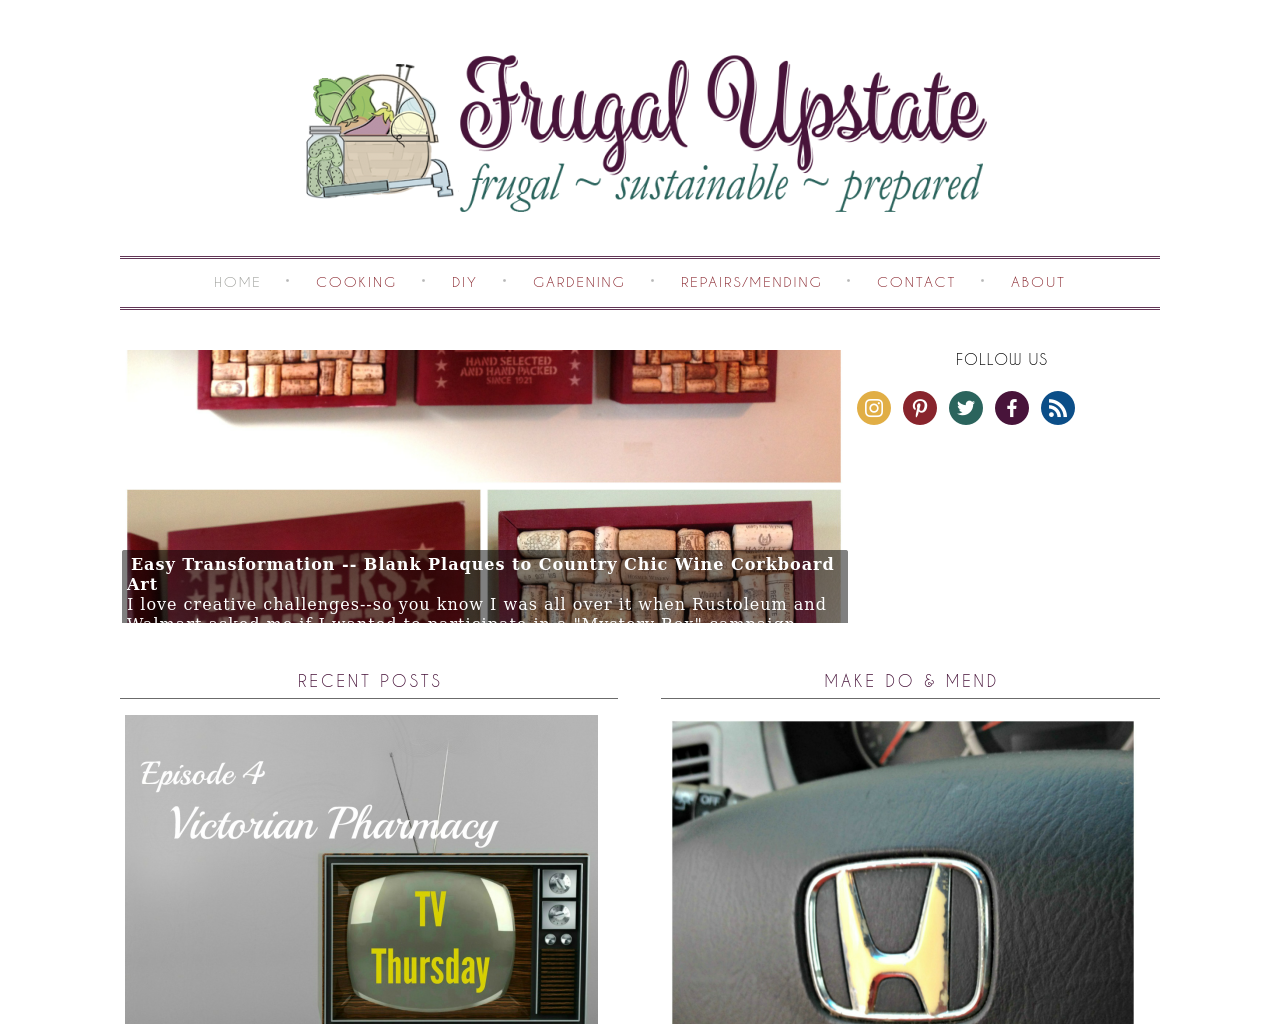 Frugal-Upstate-Advertising-Reviews-Pricing